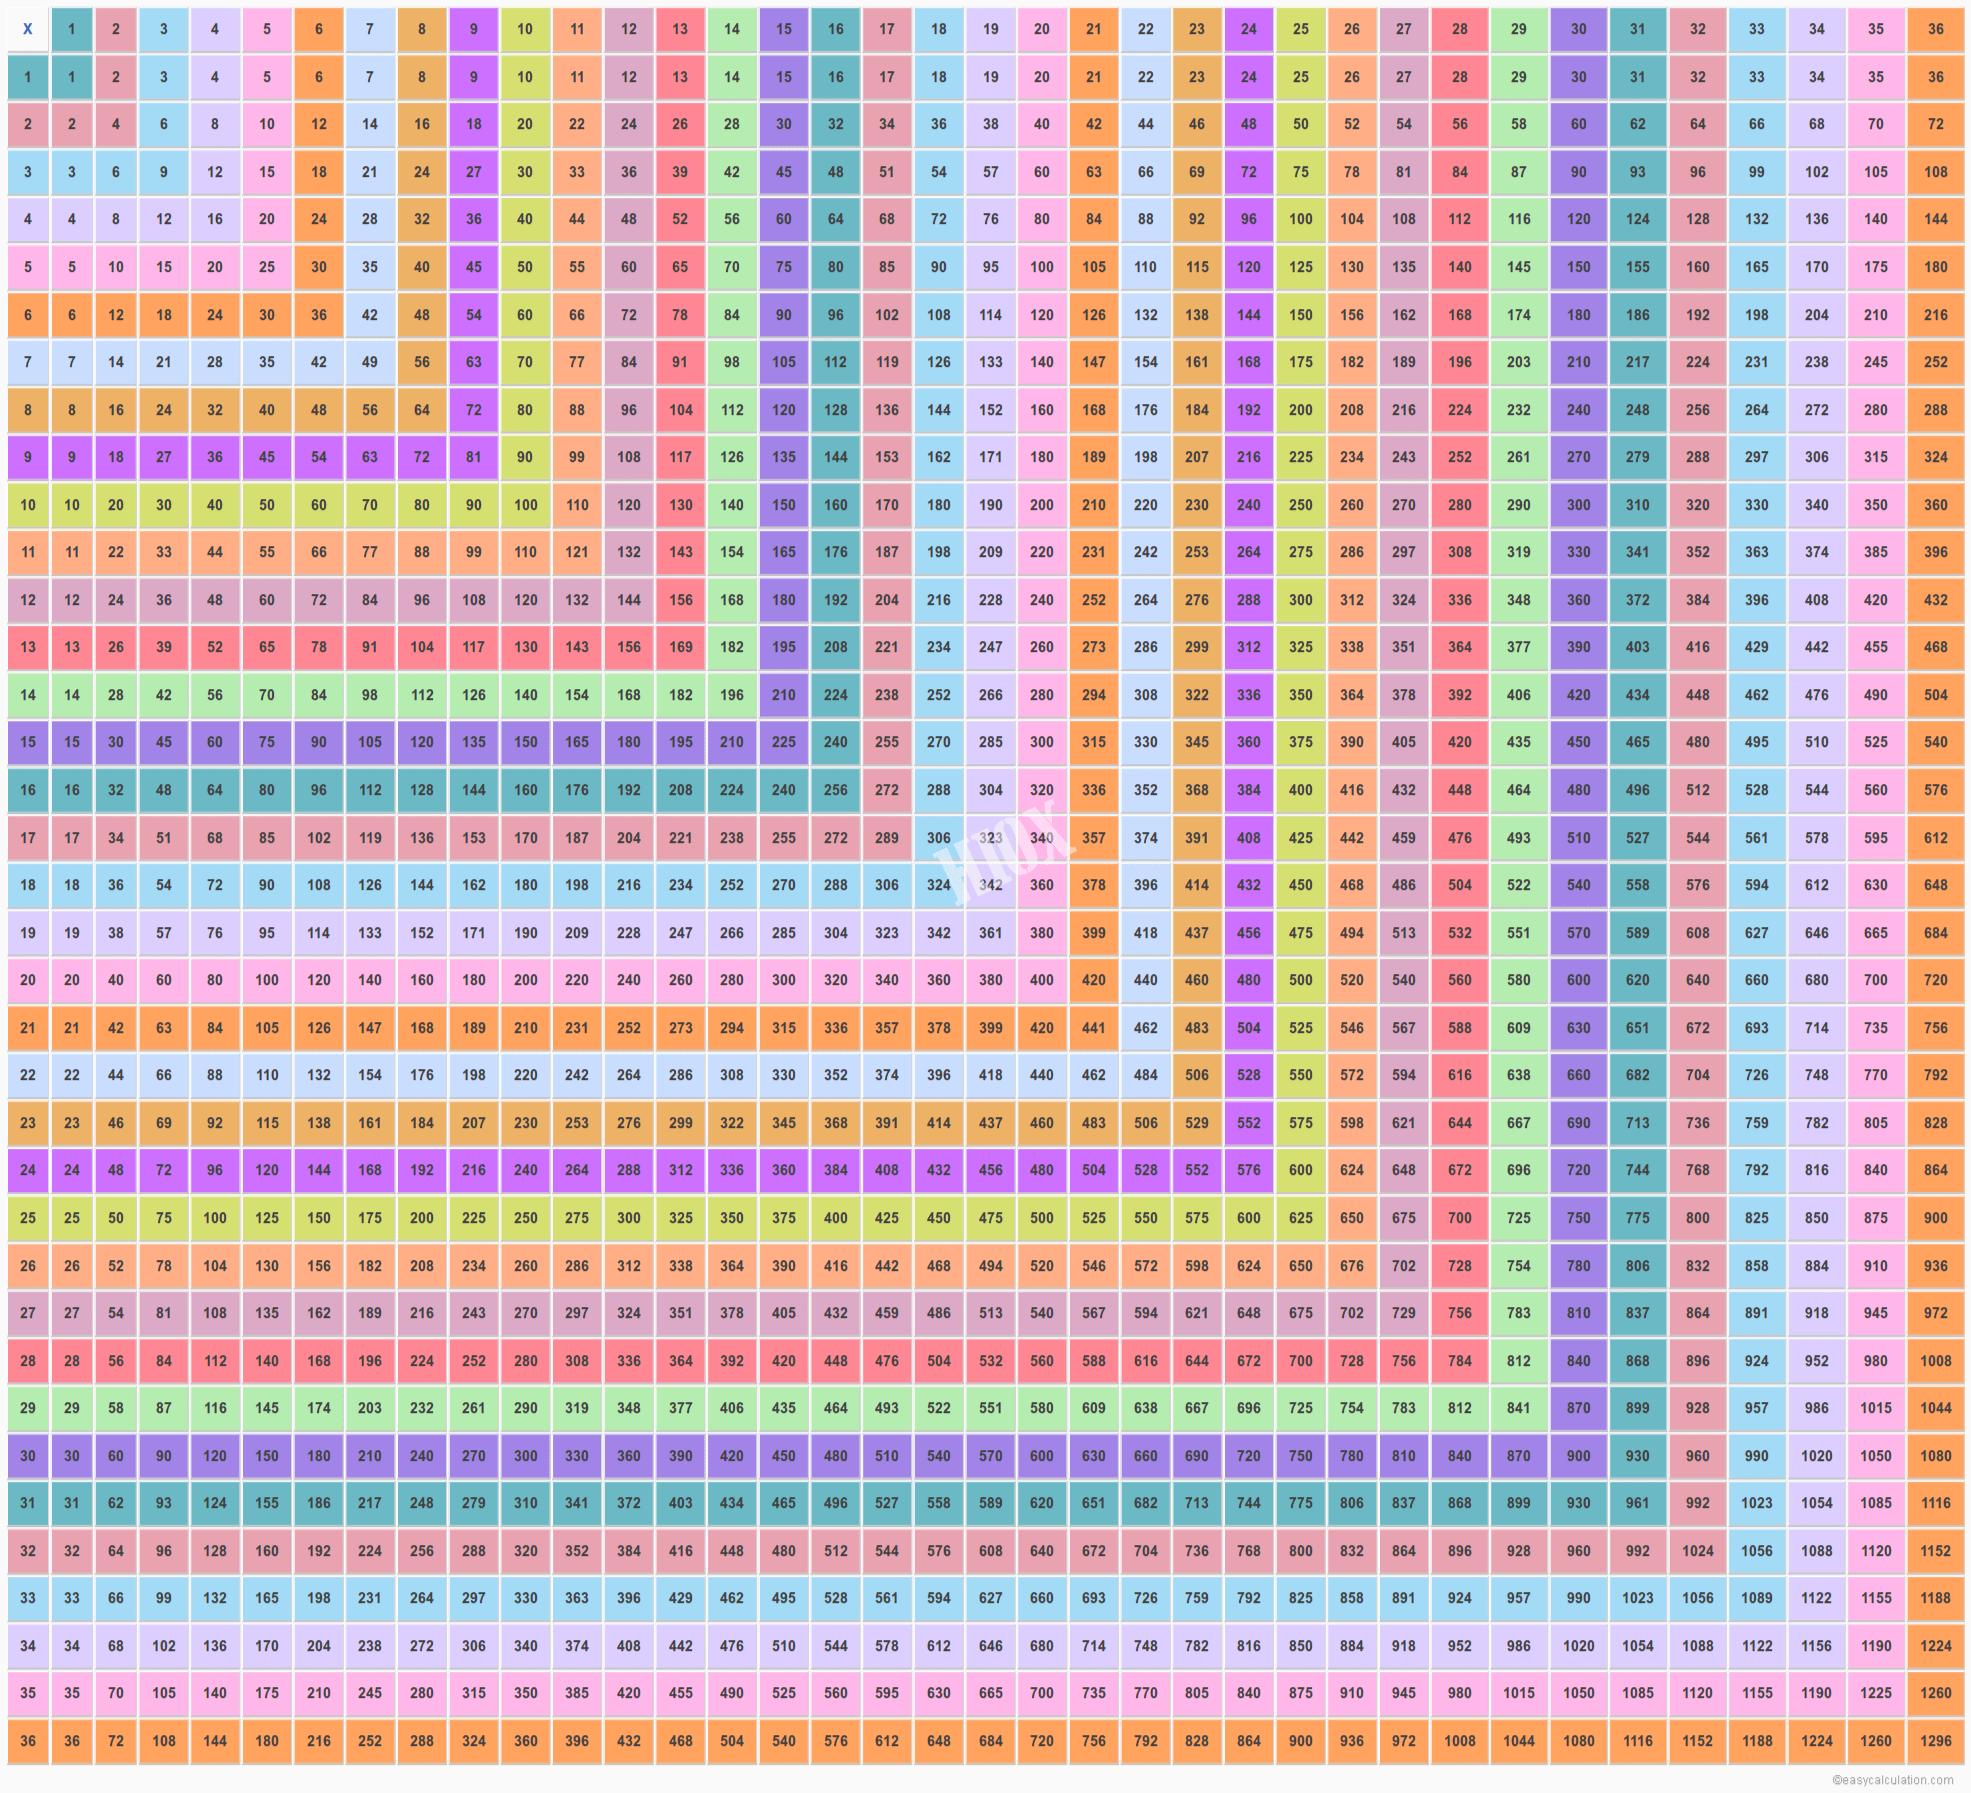 36 X 36 Multiplication Table   Multiplication Chart Upto 36